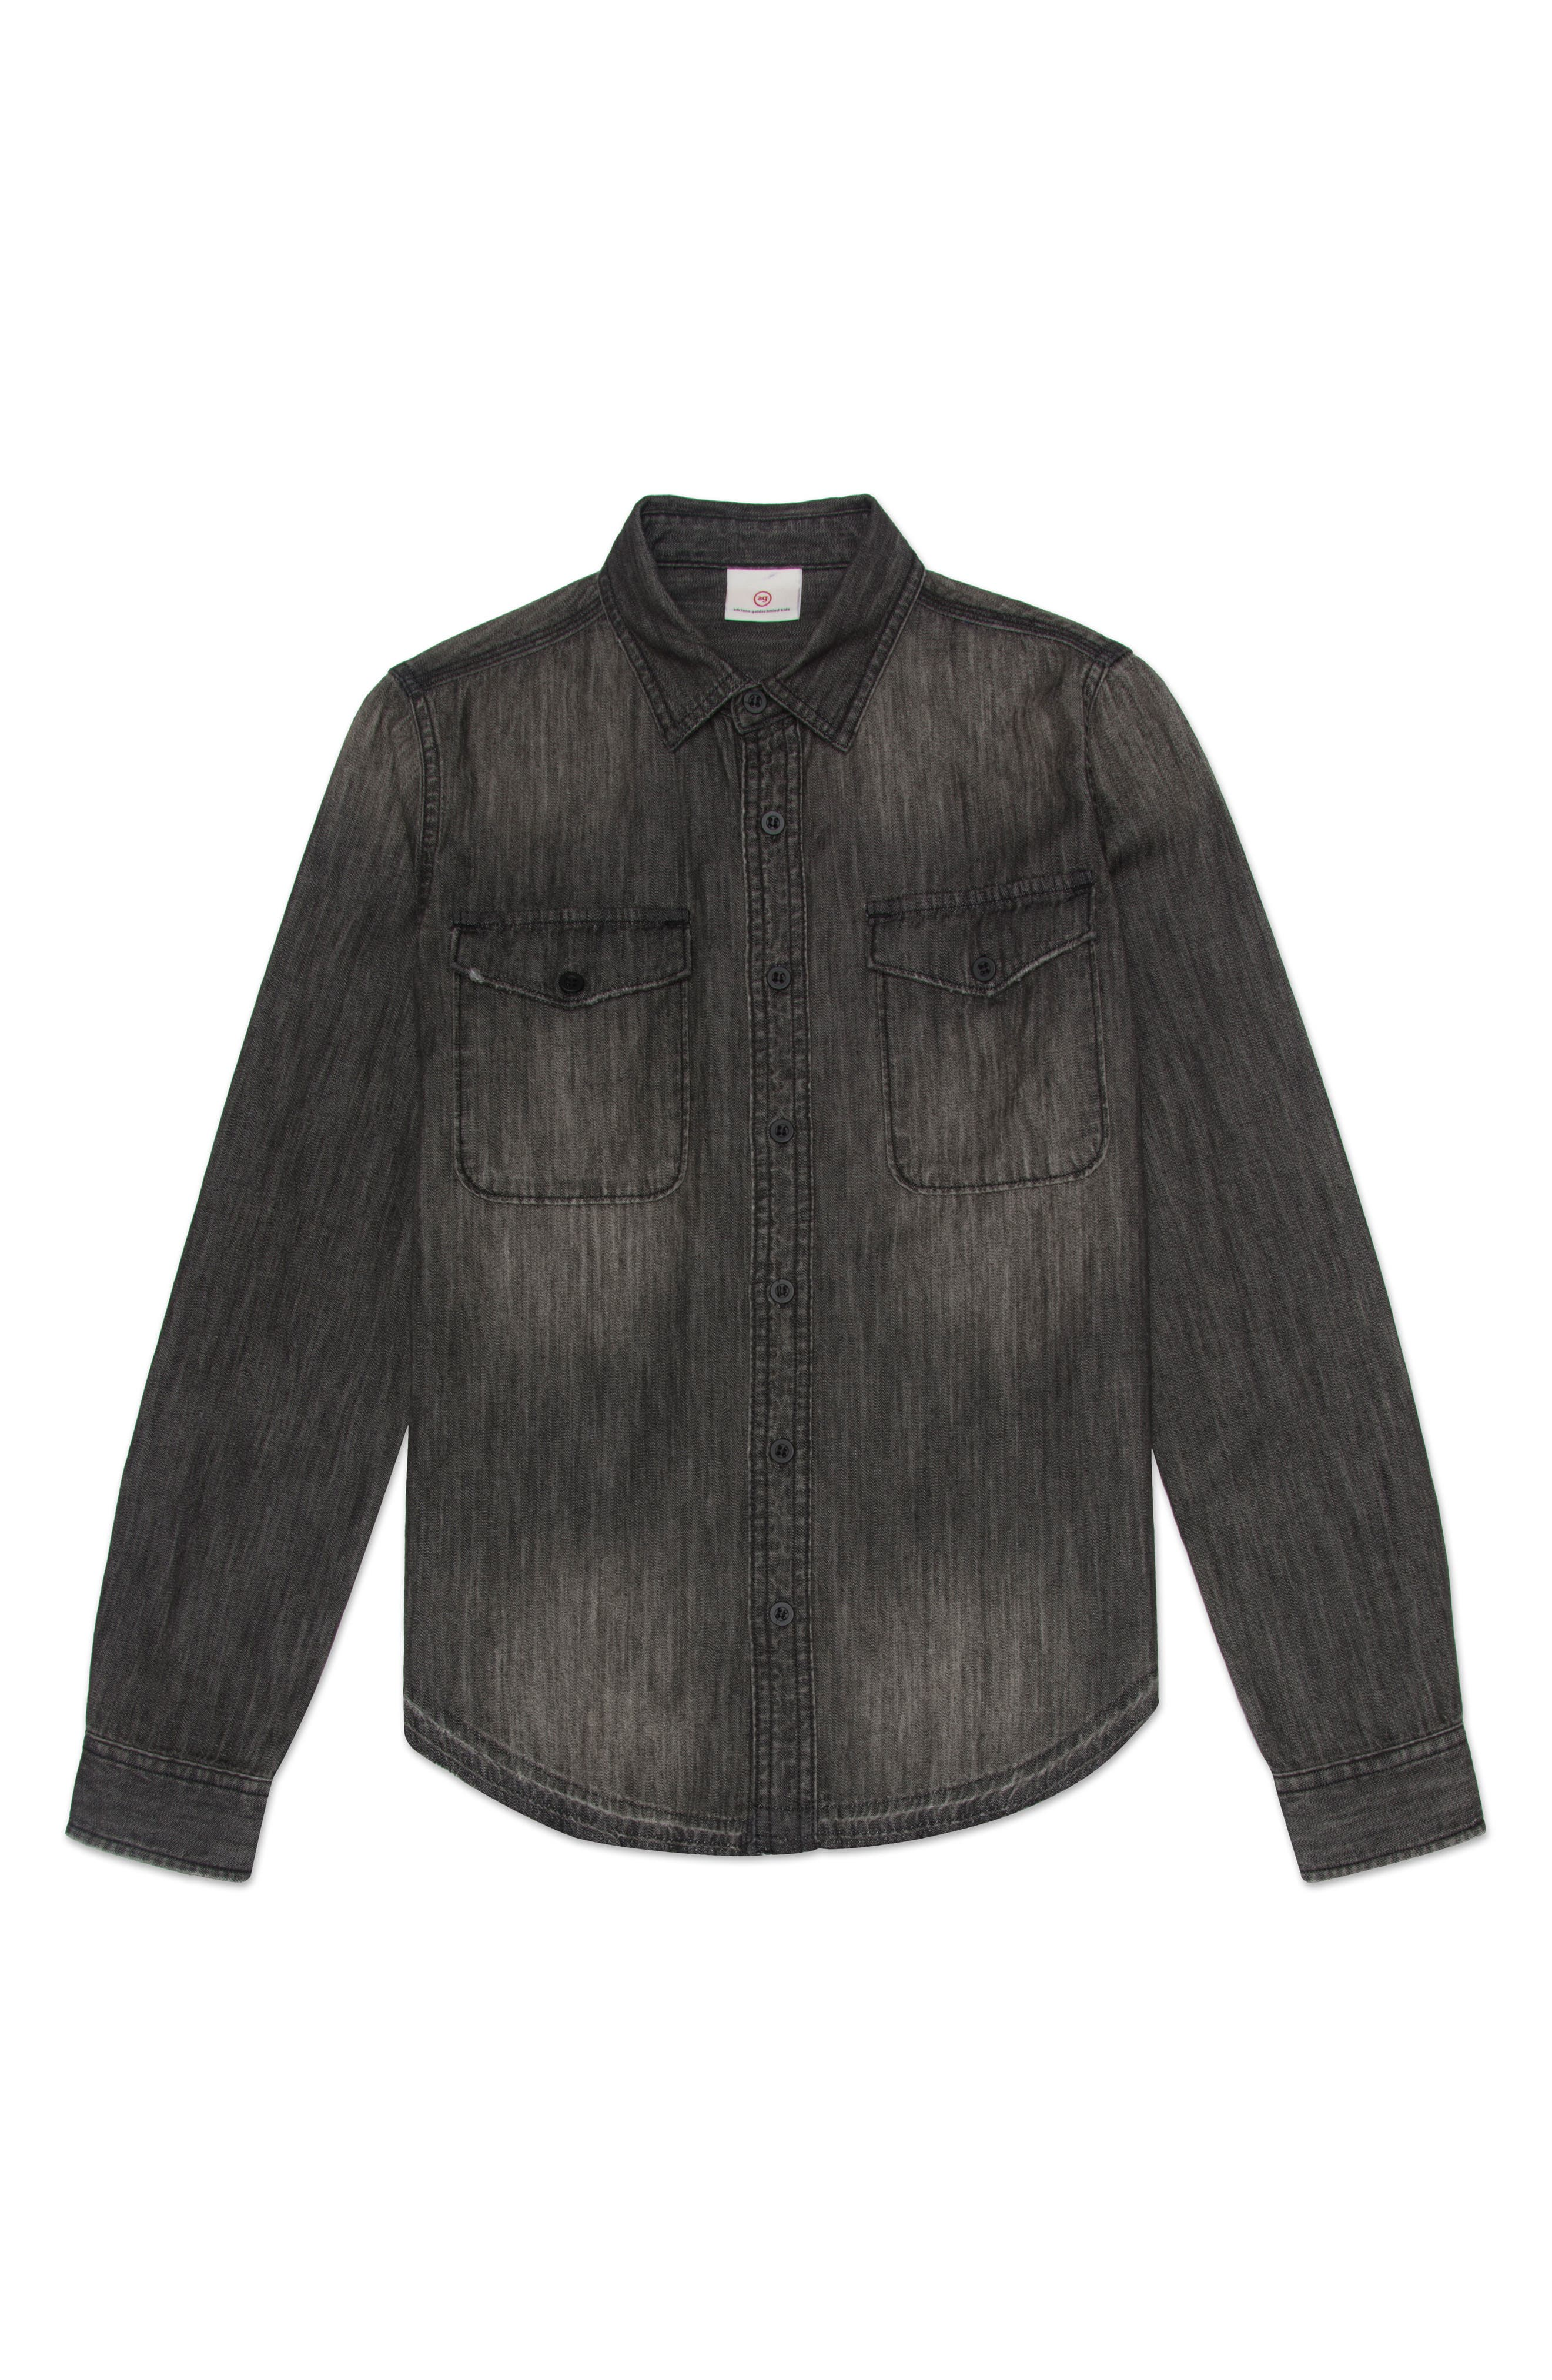 Bryson Shirt,                             Main thumbnail 1, color,                             Faded Black